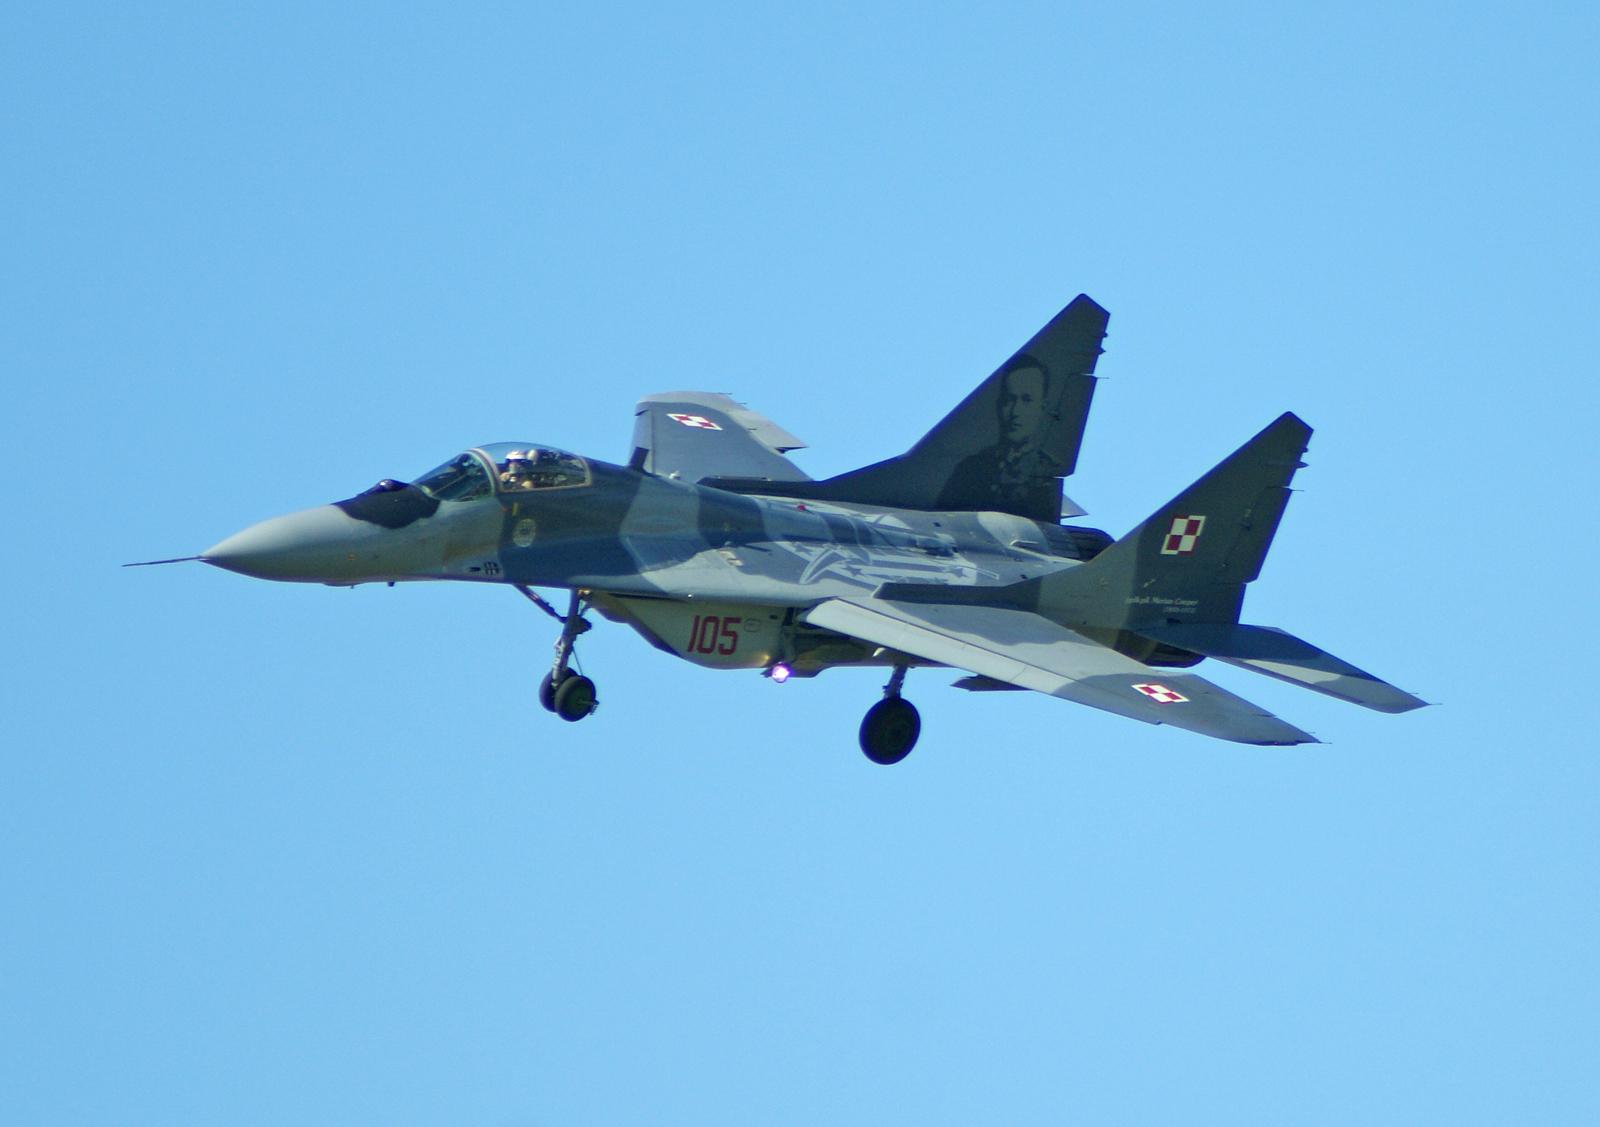 Mikoyan Gurevich MiG-29A 105, 23.BLT (1.elt) Polish Air Force